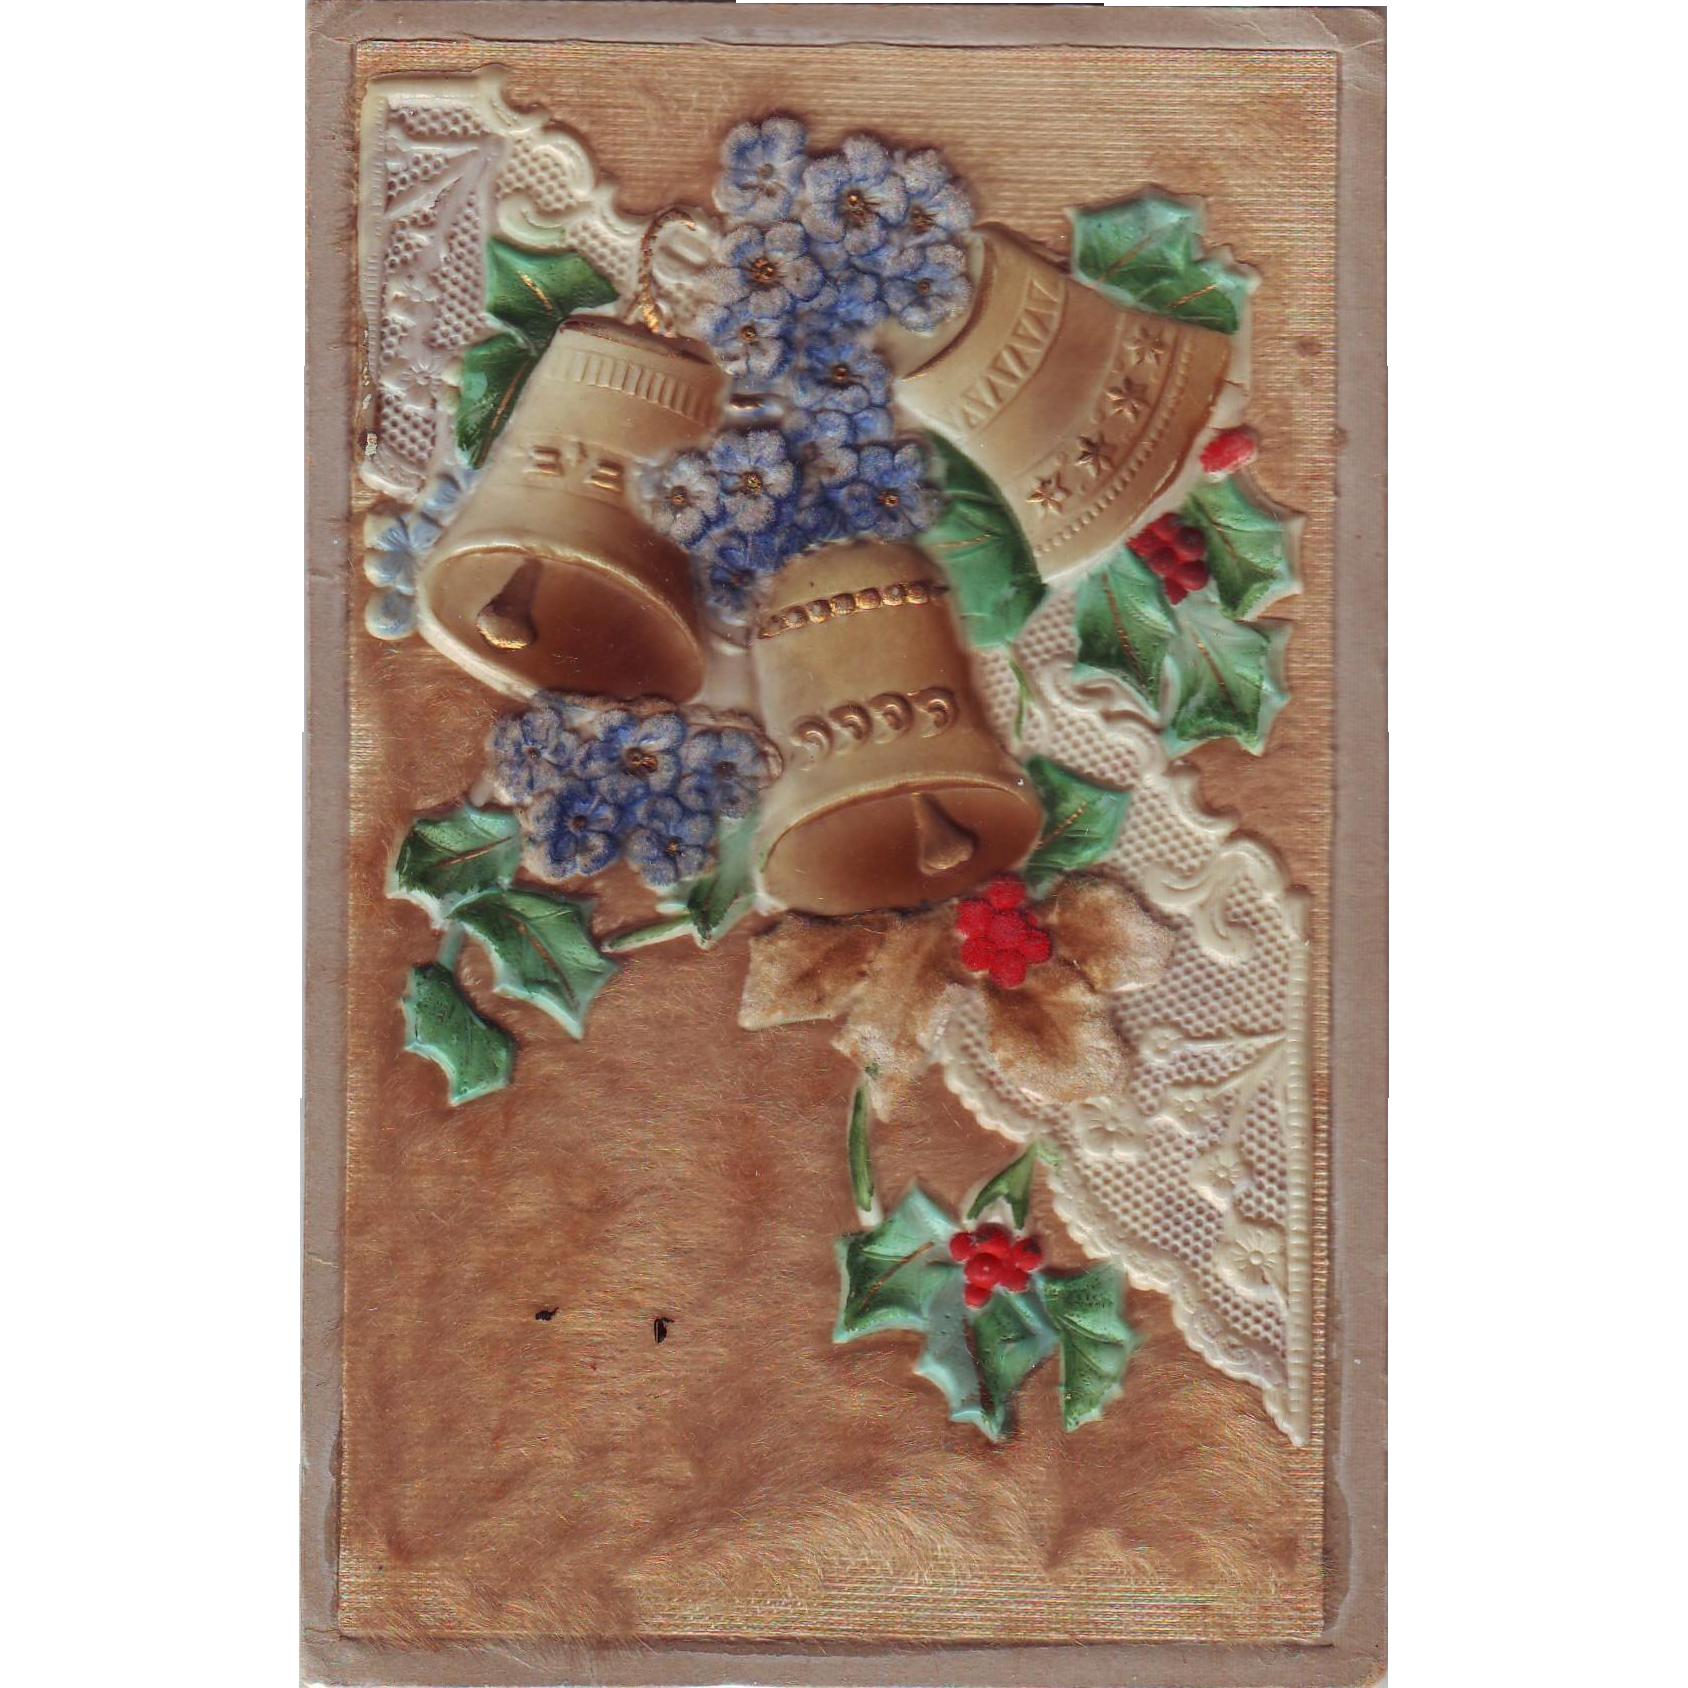 Unusual Heavily Embossed German Christmas Postcard with Fur and Bells